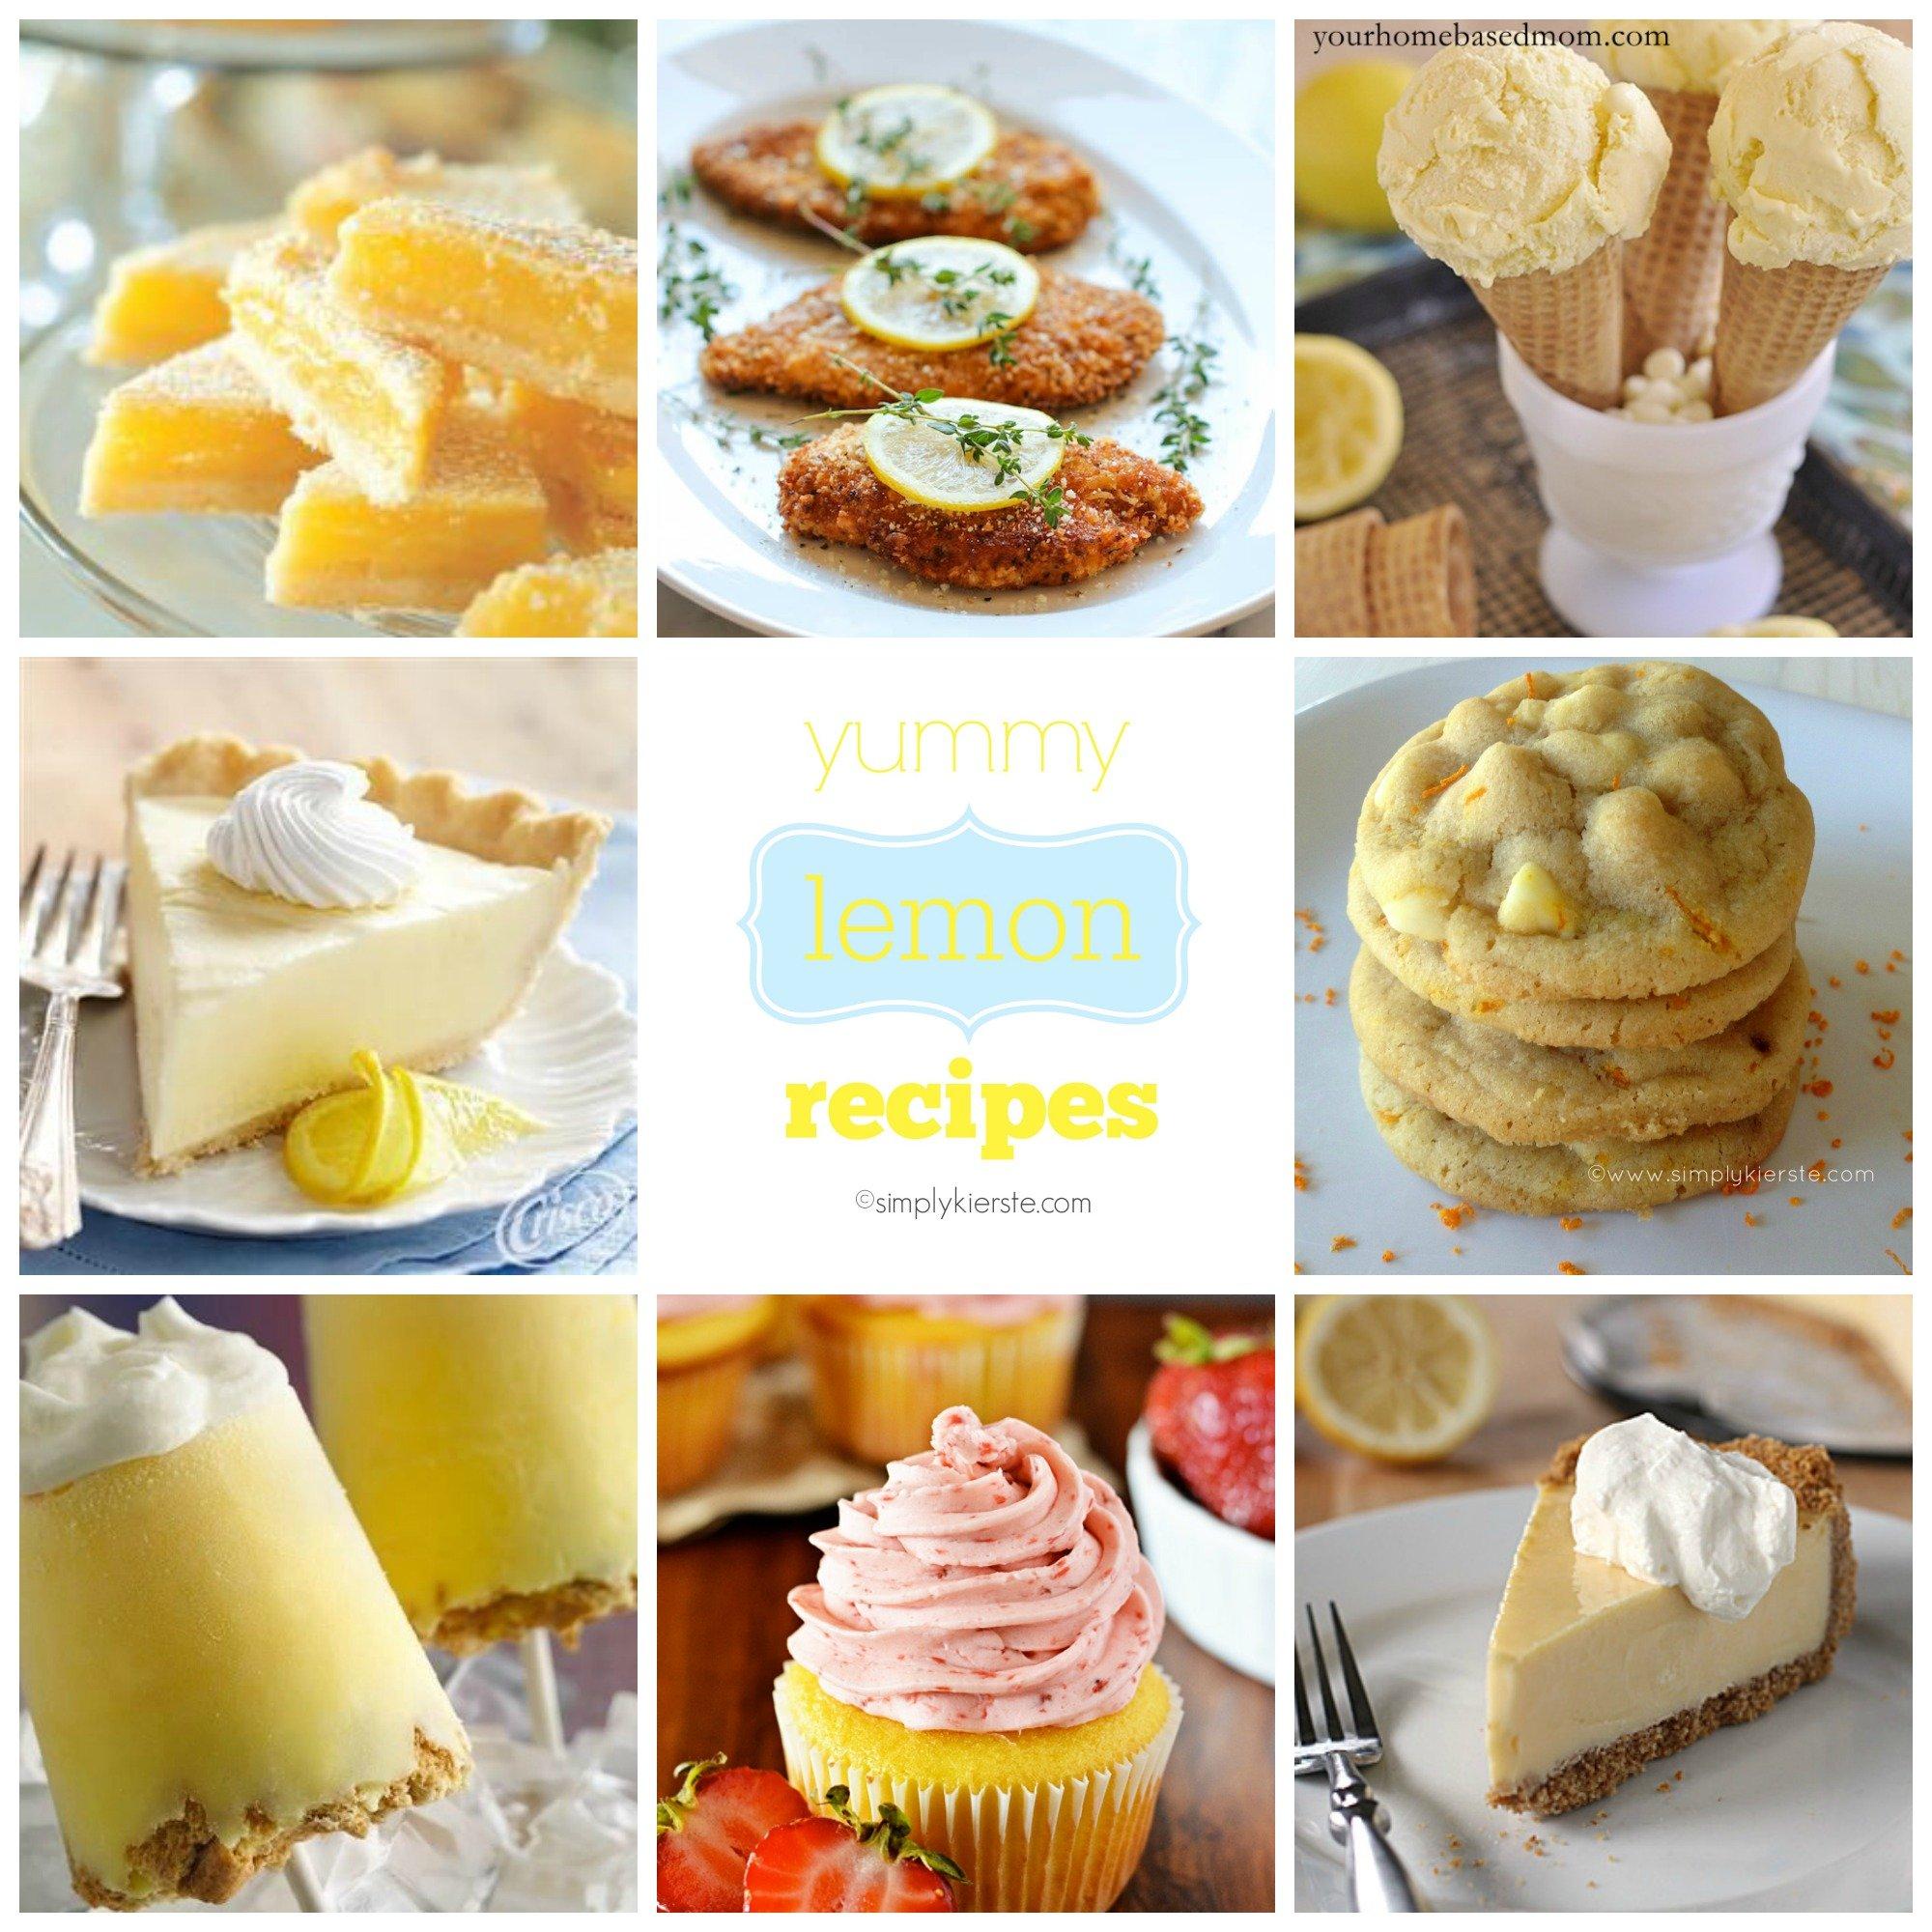 Yummy Lemon Recipes